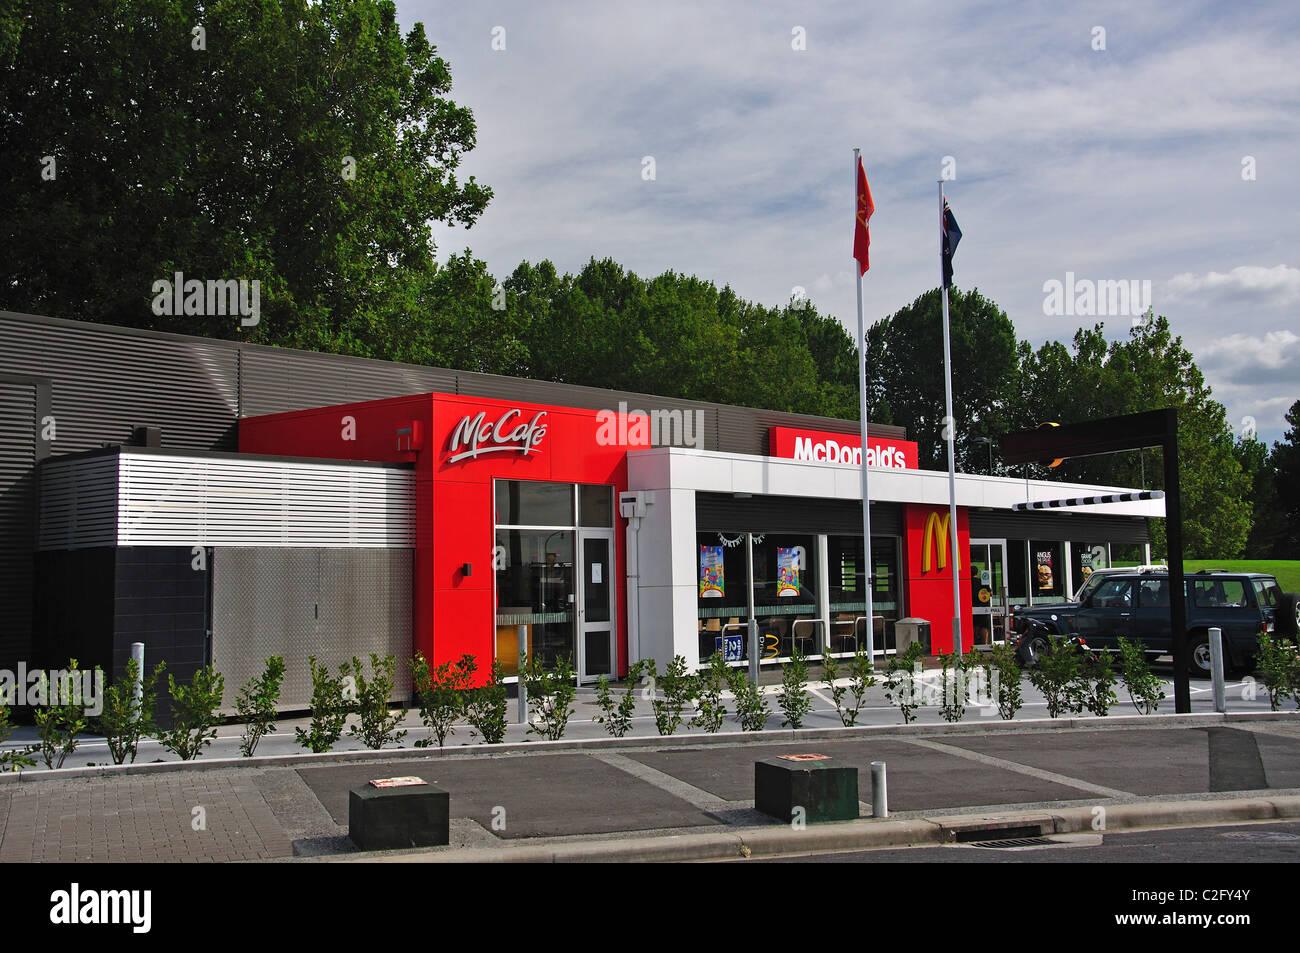 Un restaurant Mcdonald's, moderne, Tschagguns Rd, Paeroa, de la région de Waikato, Nouvelle-Zélande, Photo Stock